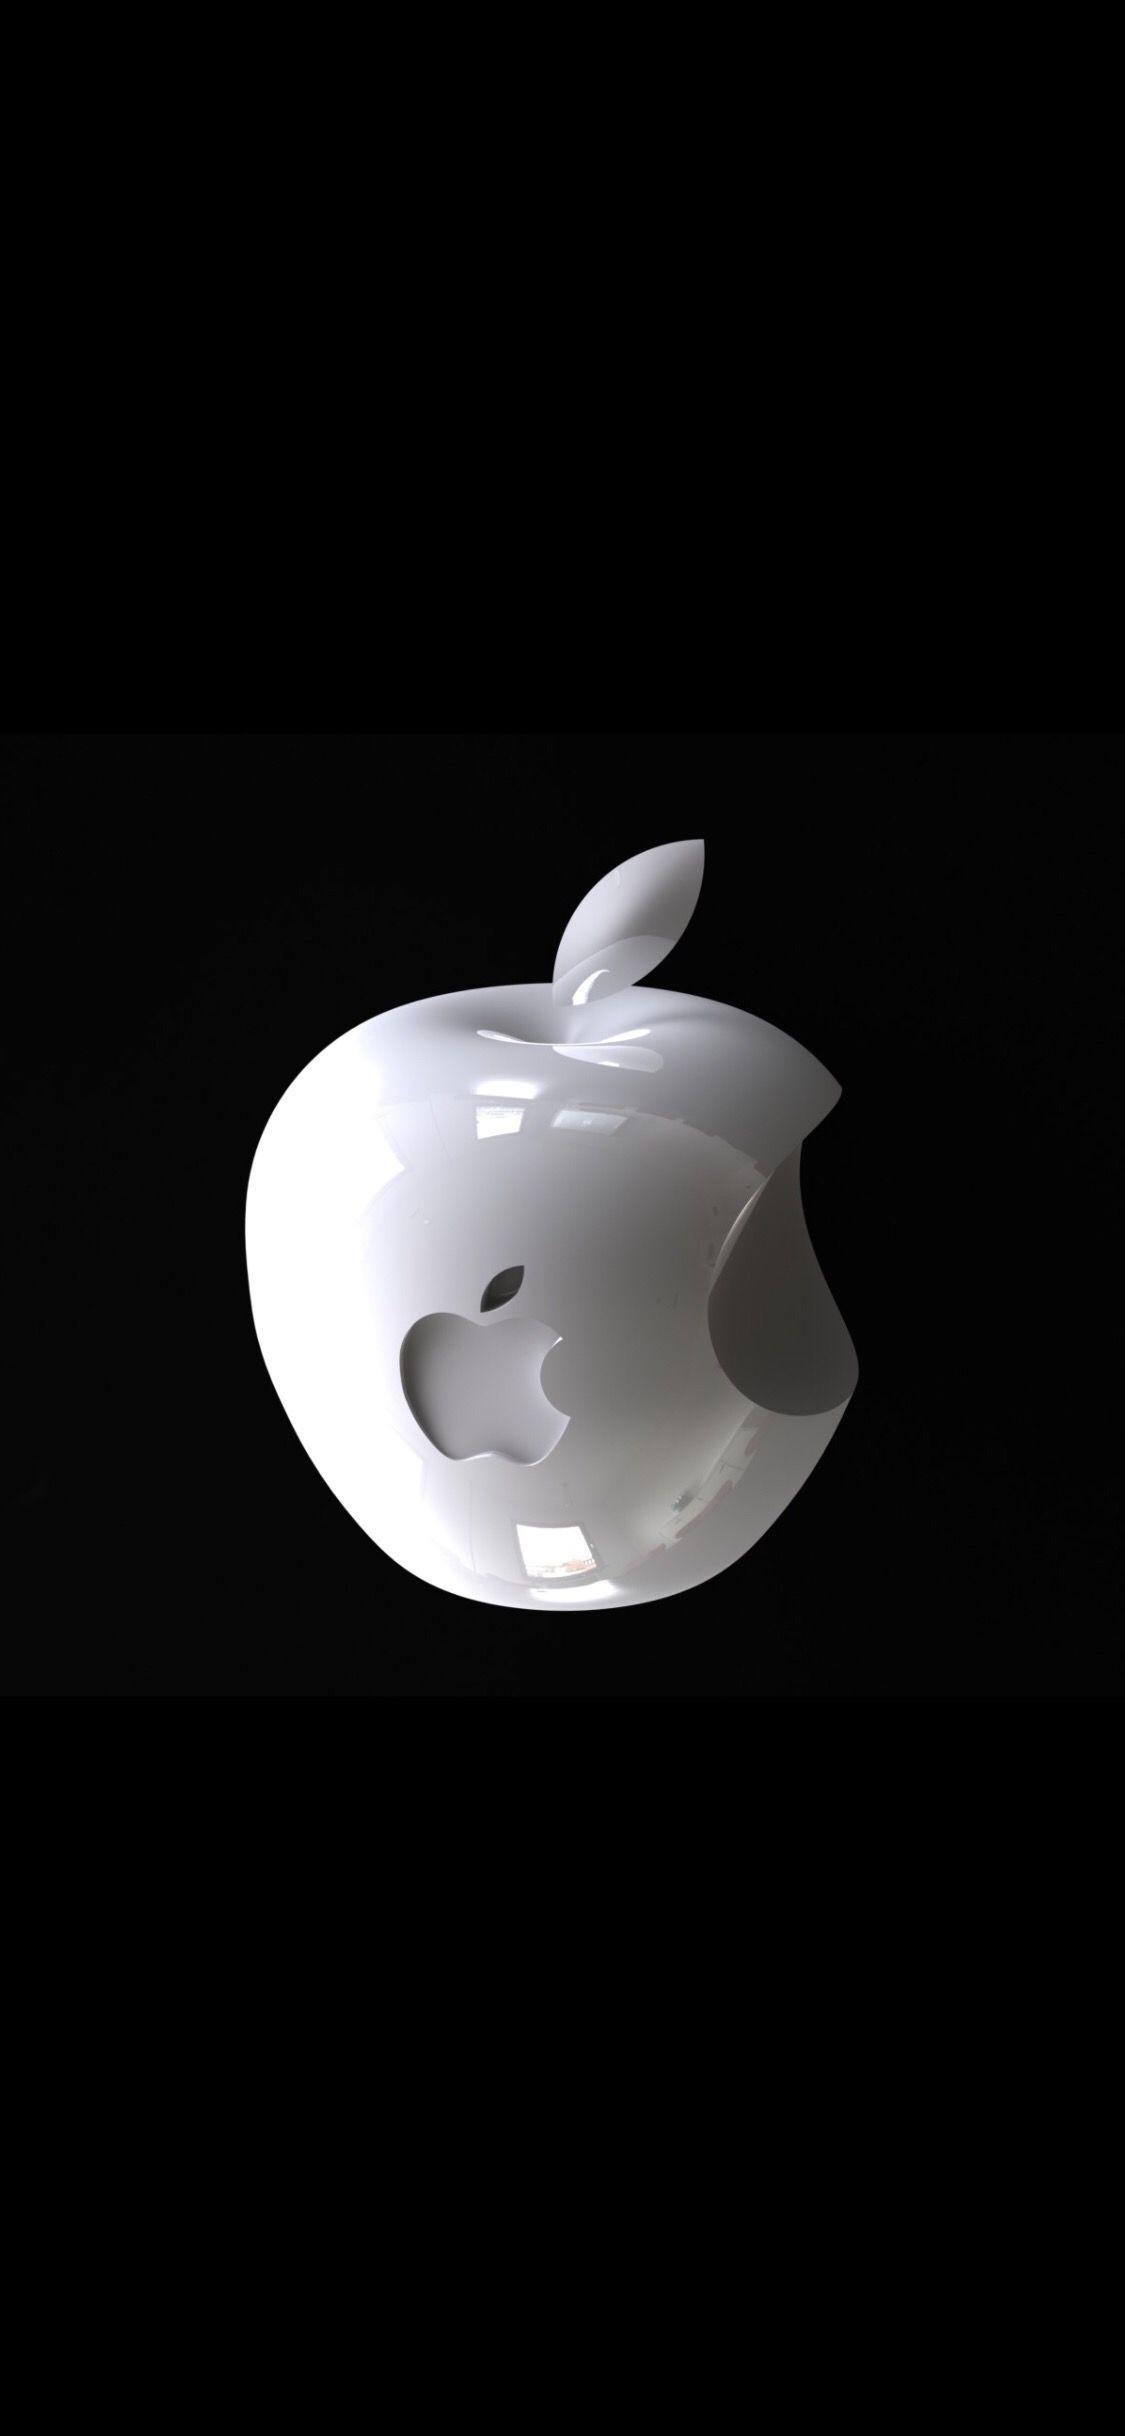 3d Apple Apple Logo Wallpaper Iphone Iphone Wallpaper Logo Iphone Homescreen Wallpaper